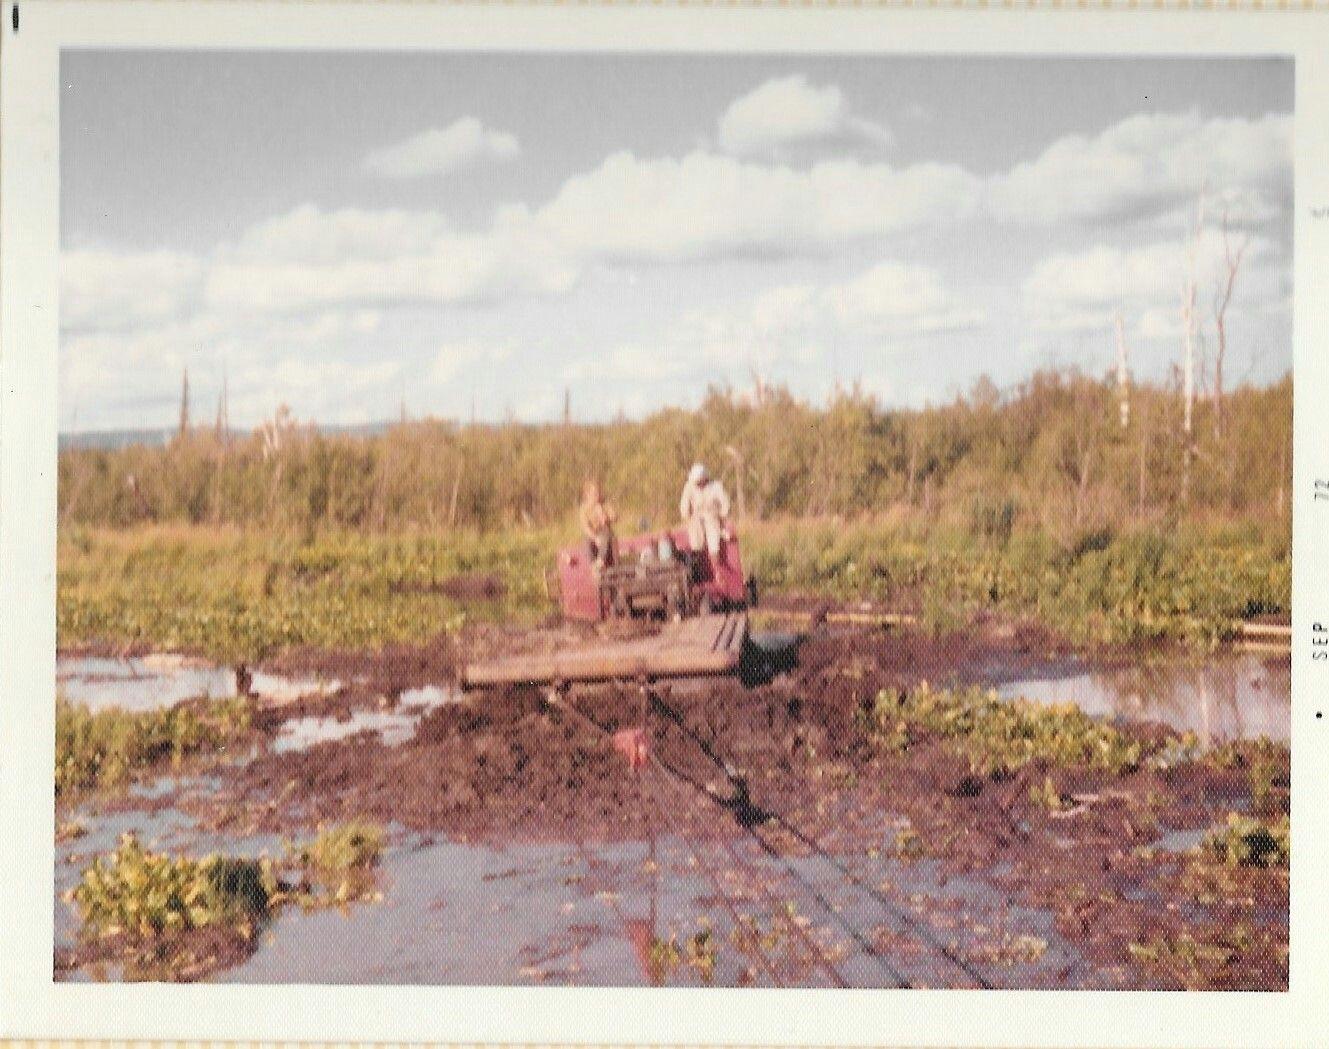 Nodwel recovery about 1970 Oilfield, Old trucks, Oil